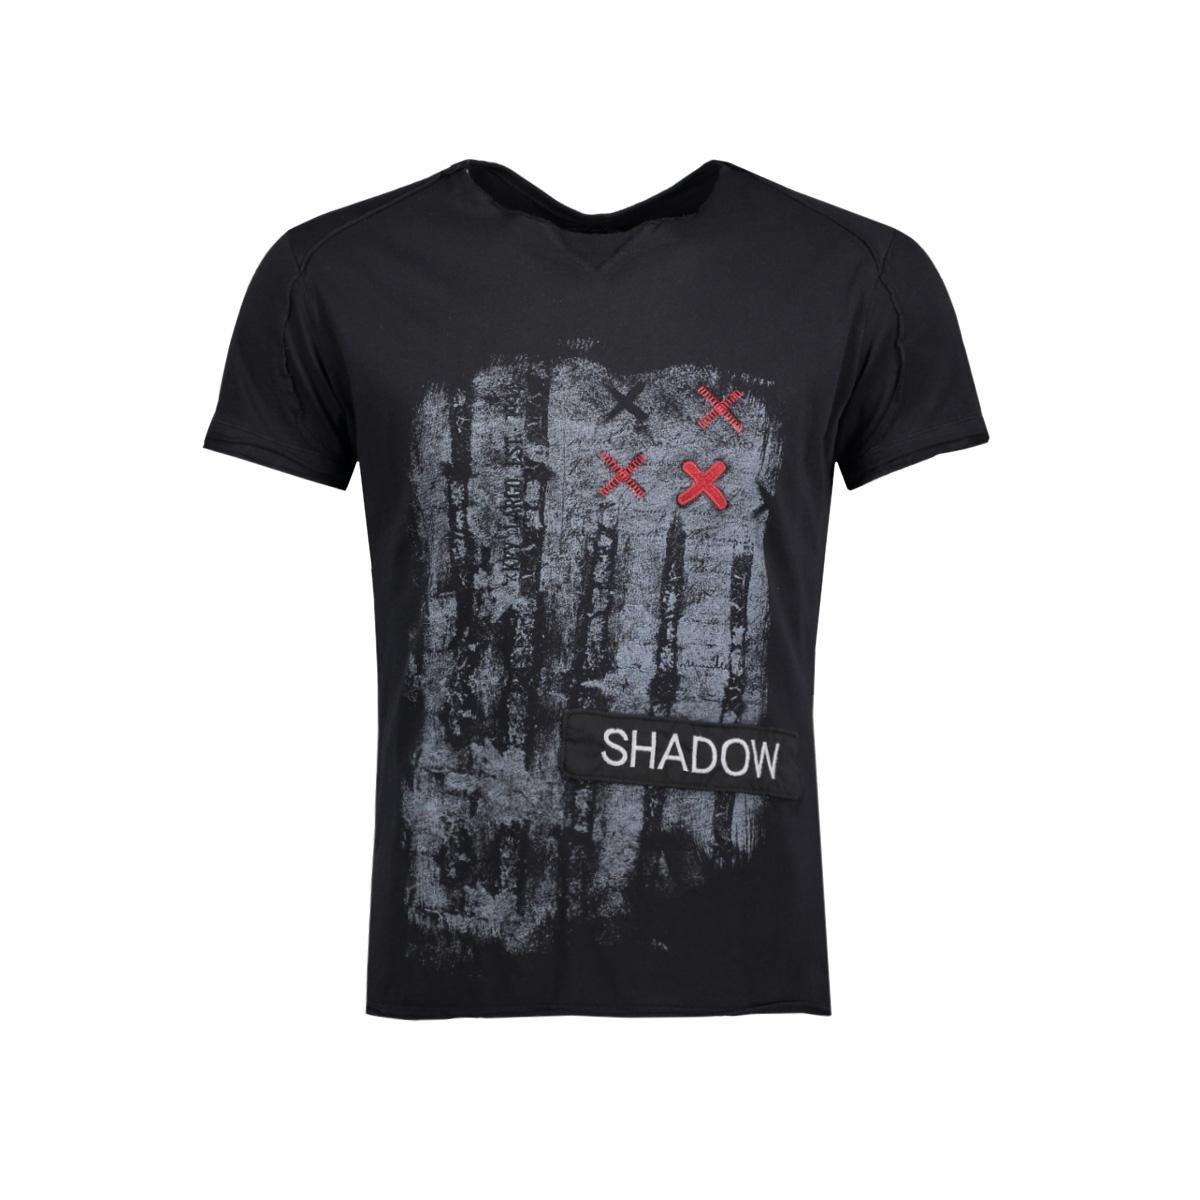 mt00059 shadow key largo t-shirt black